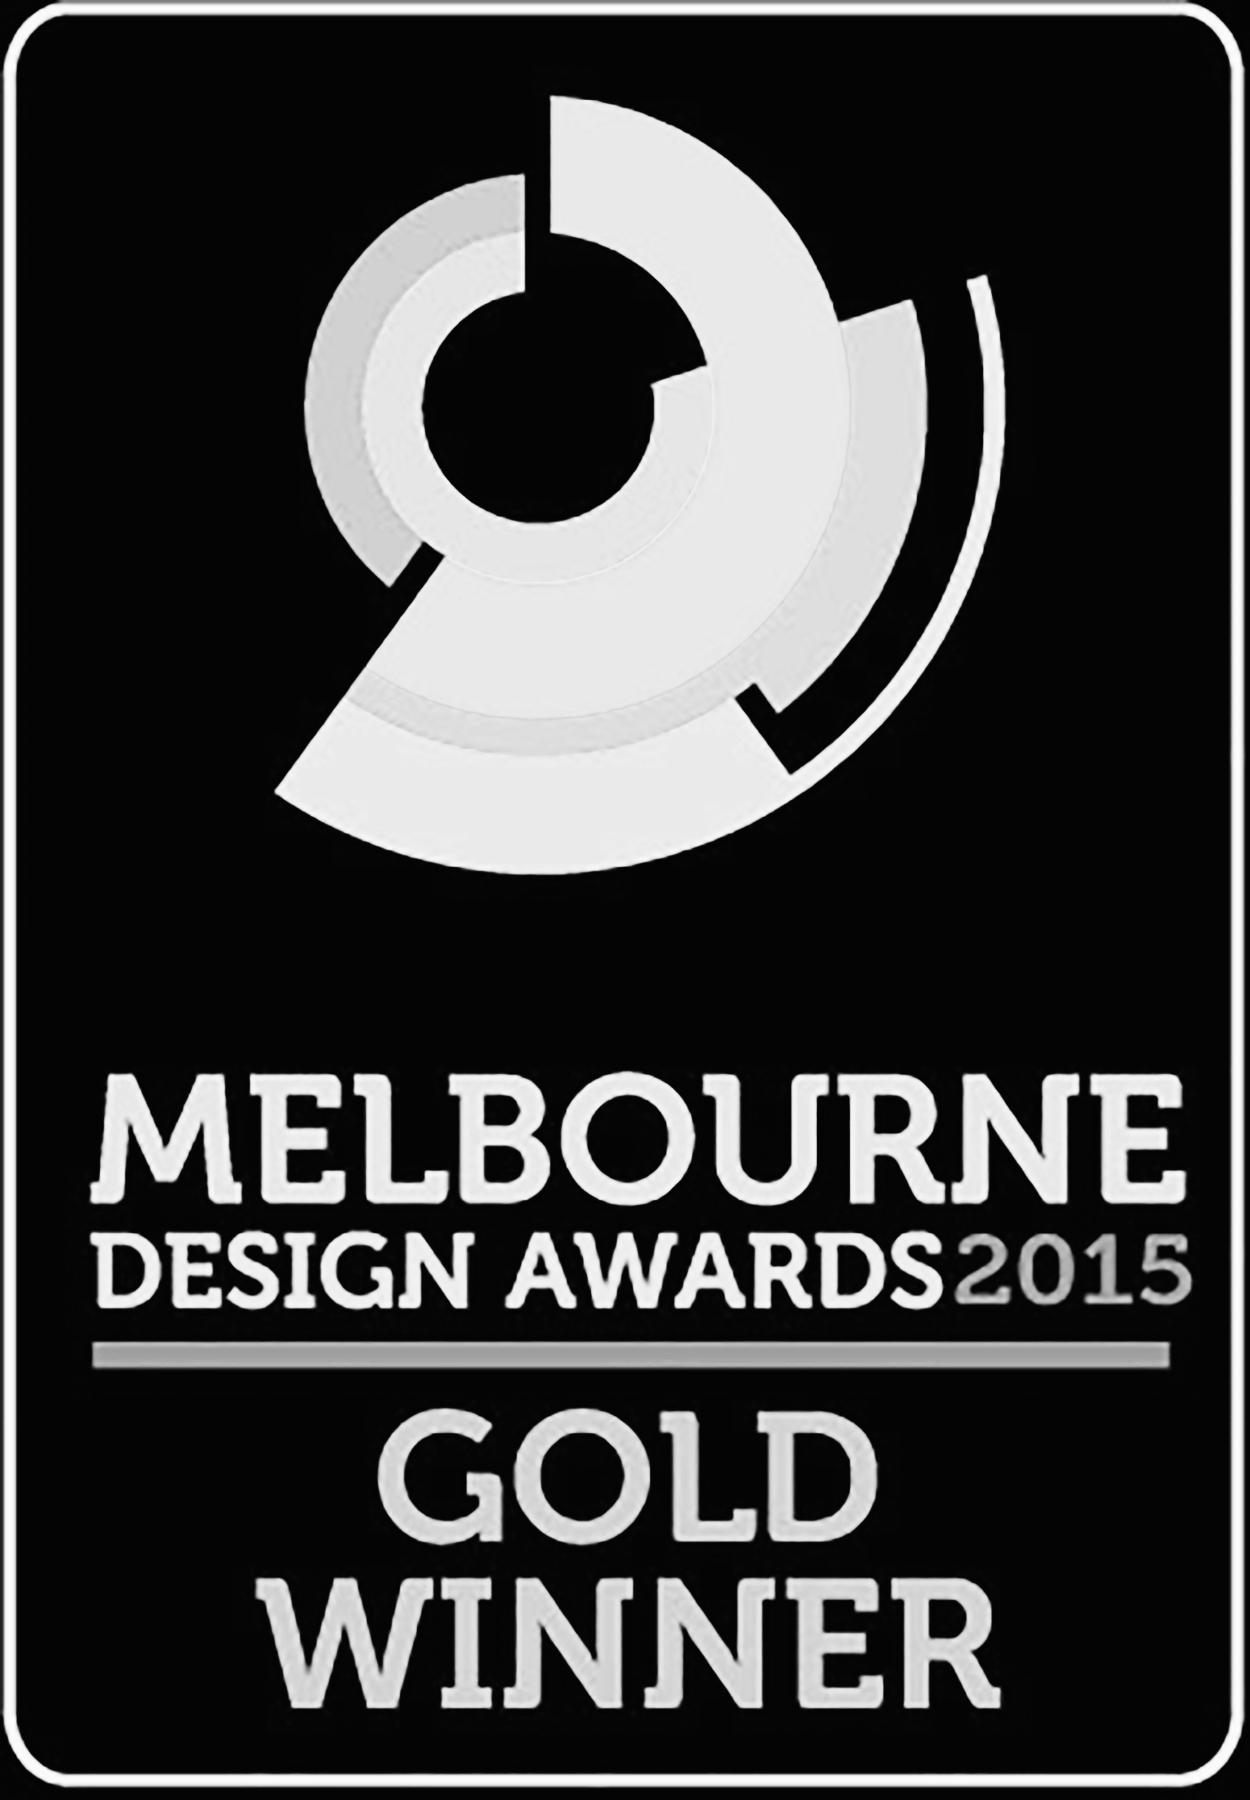 MEL15-GOLD-tile_SWG STUDIO_SANTOSO BUDIMAN_GREG ROYCE_MELBOURNE_AUSTRALIA_BLK&WHT.jpg